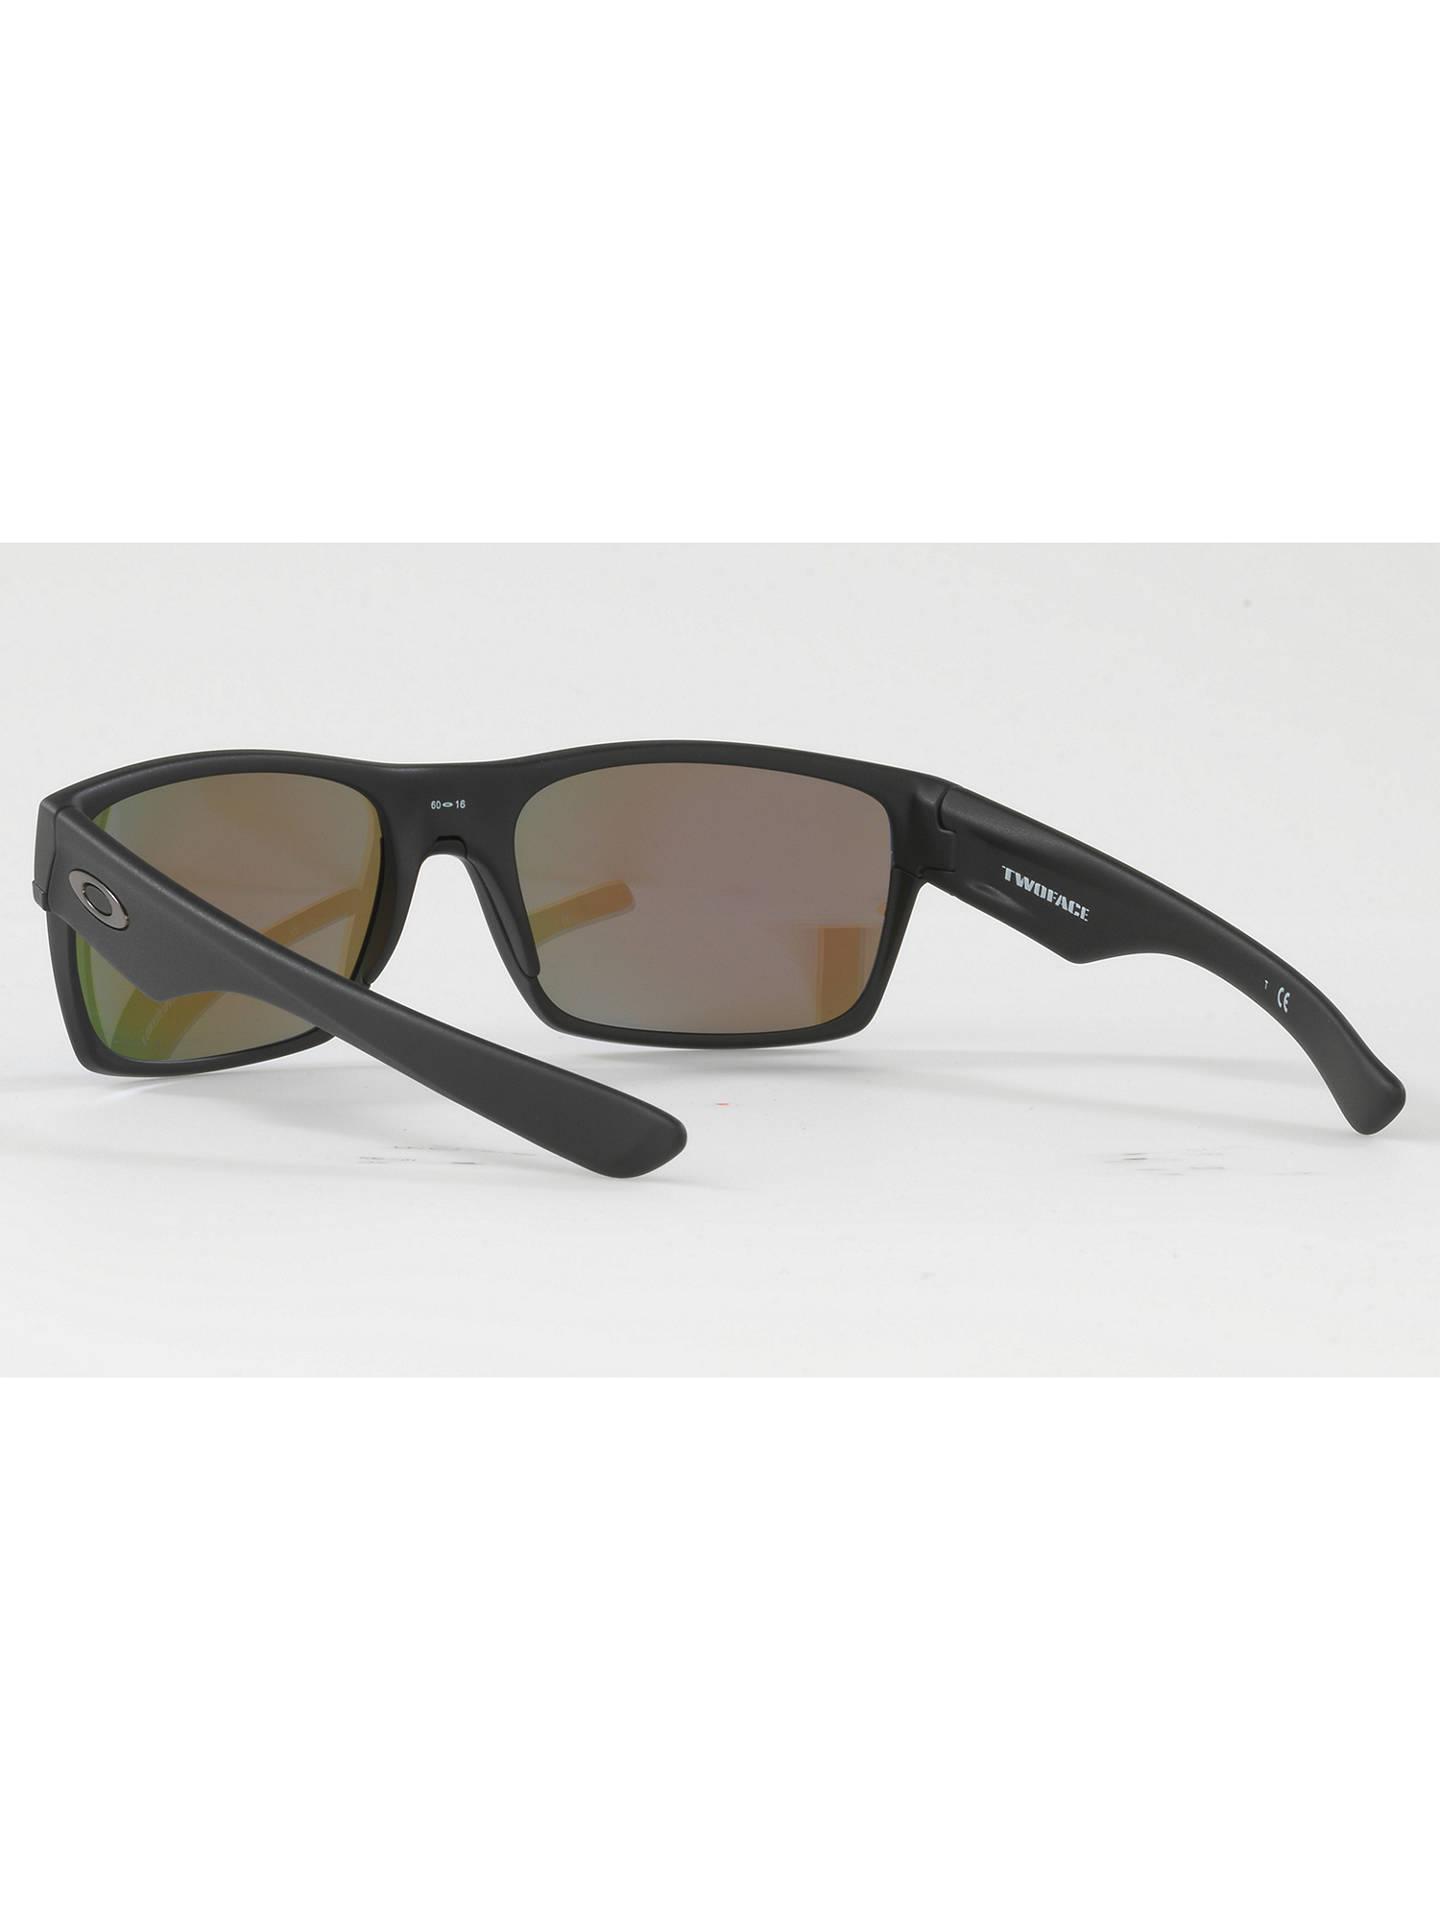 0cb8831f54 ... Buy Oakley OO9189 Two Face Polarised Square Sunglasses